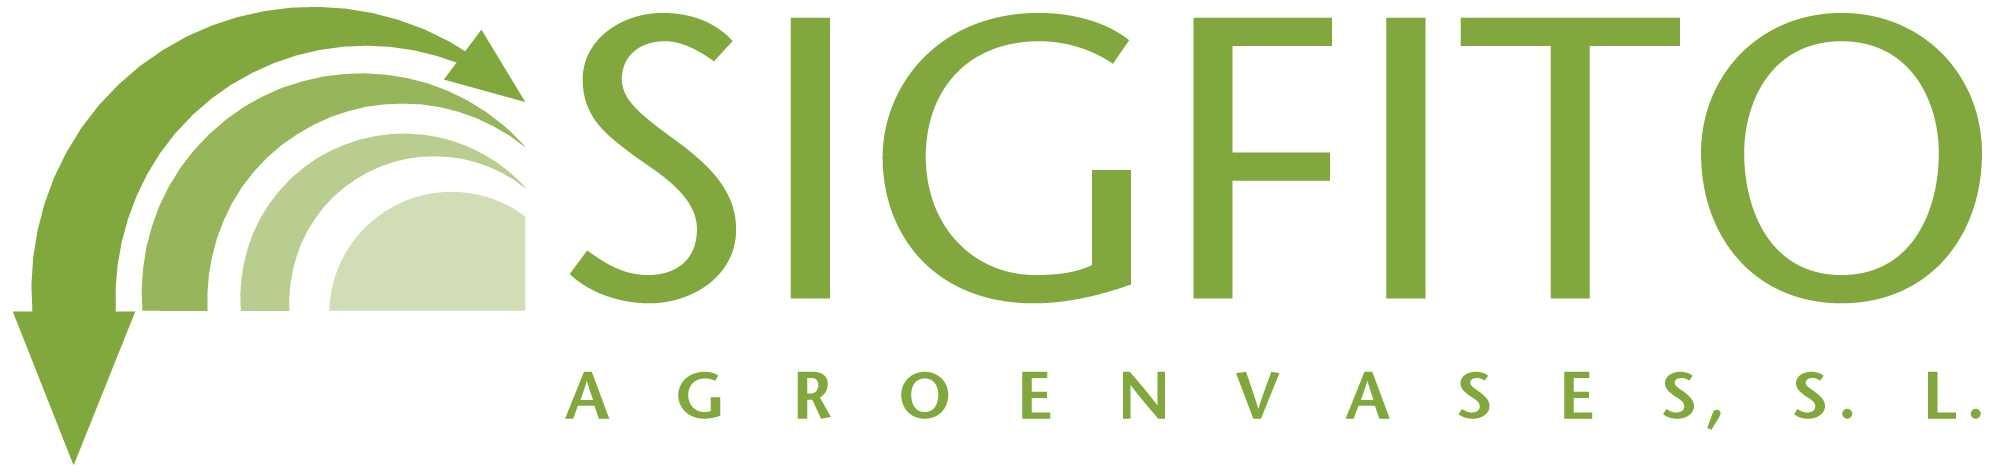 https://europeanplasticspact.org/wp-content/uploads/2020/03/Sigfito-Agroenvases-S.L.jpg